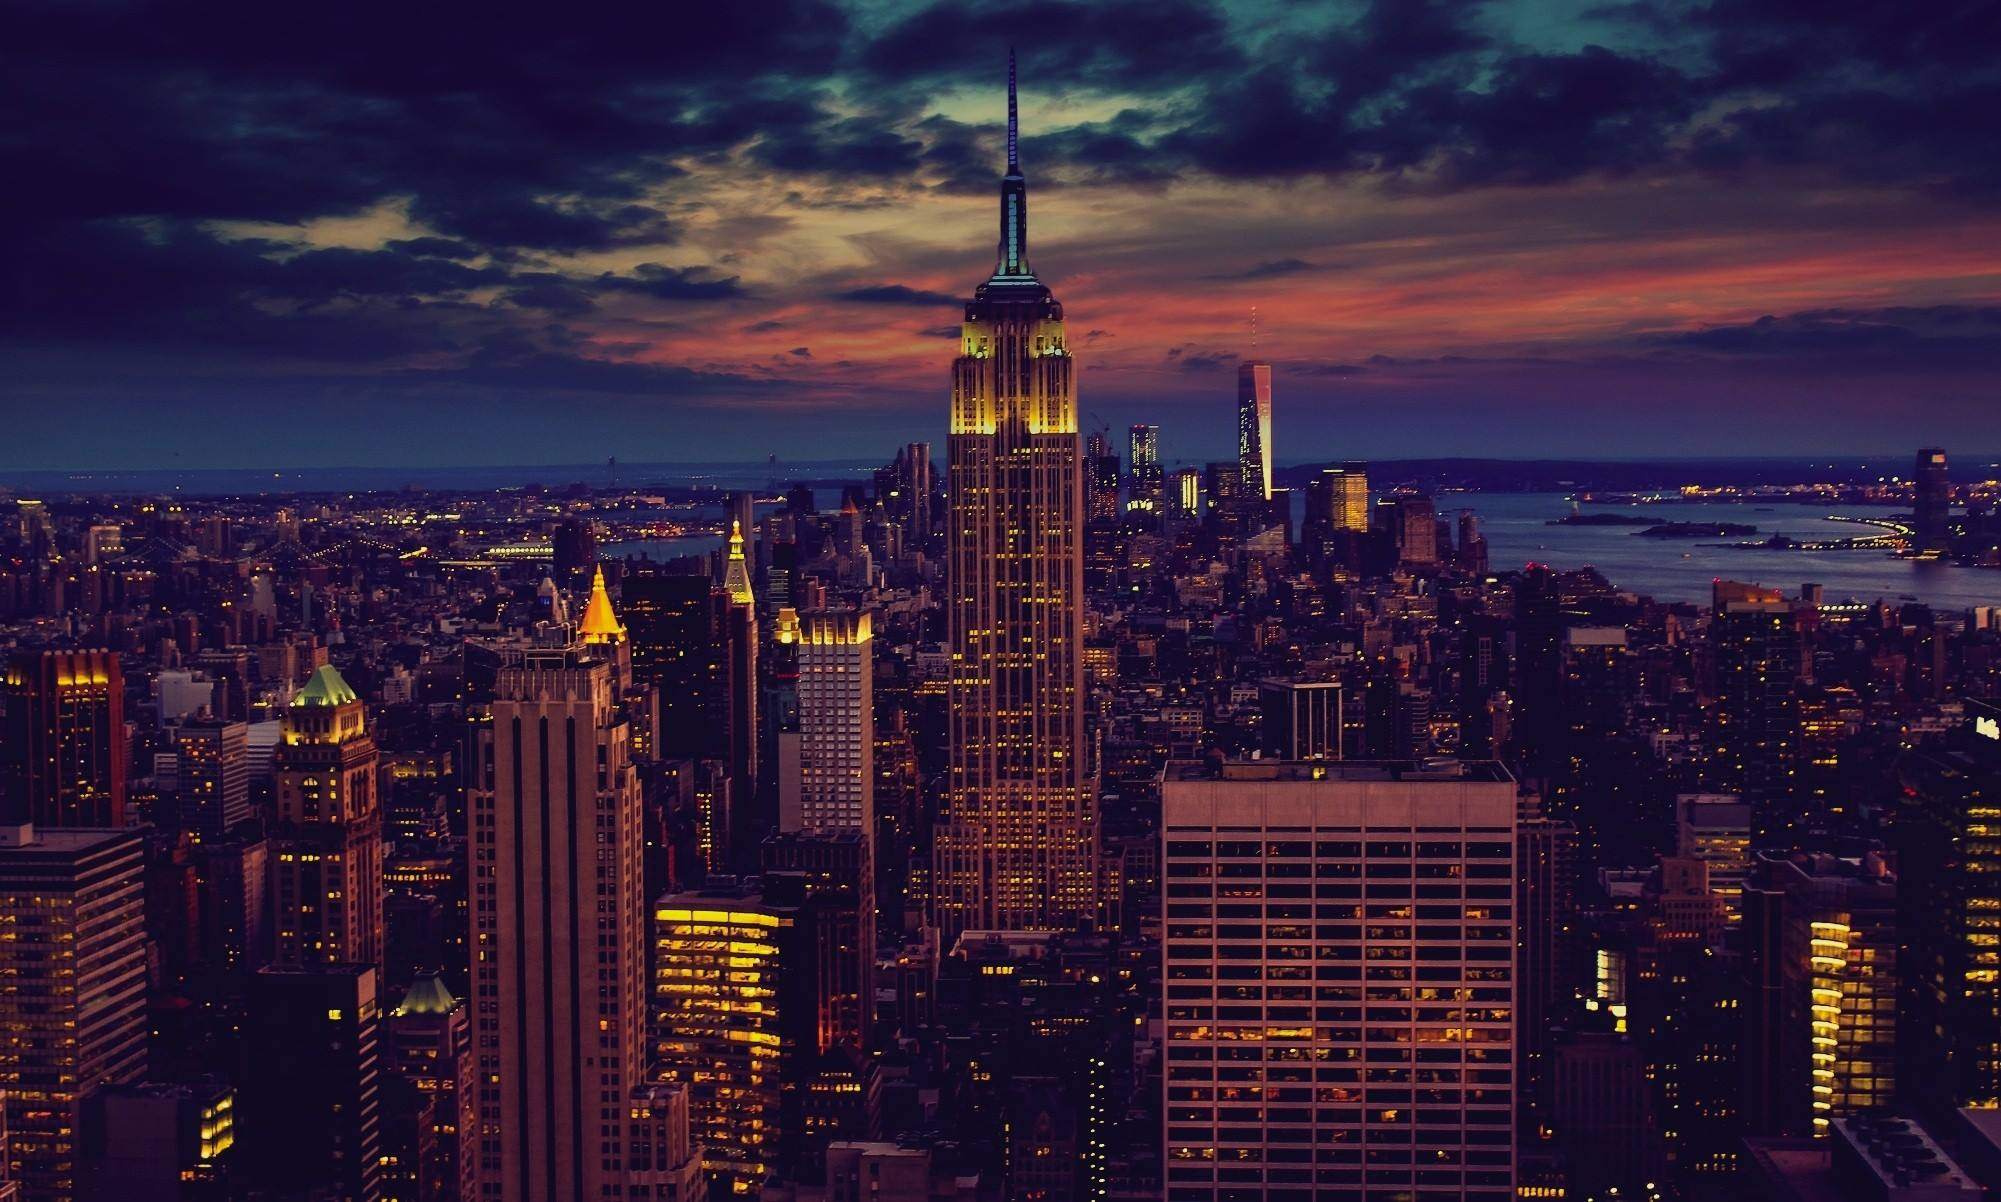 new york empire state building city night lights